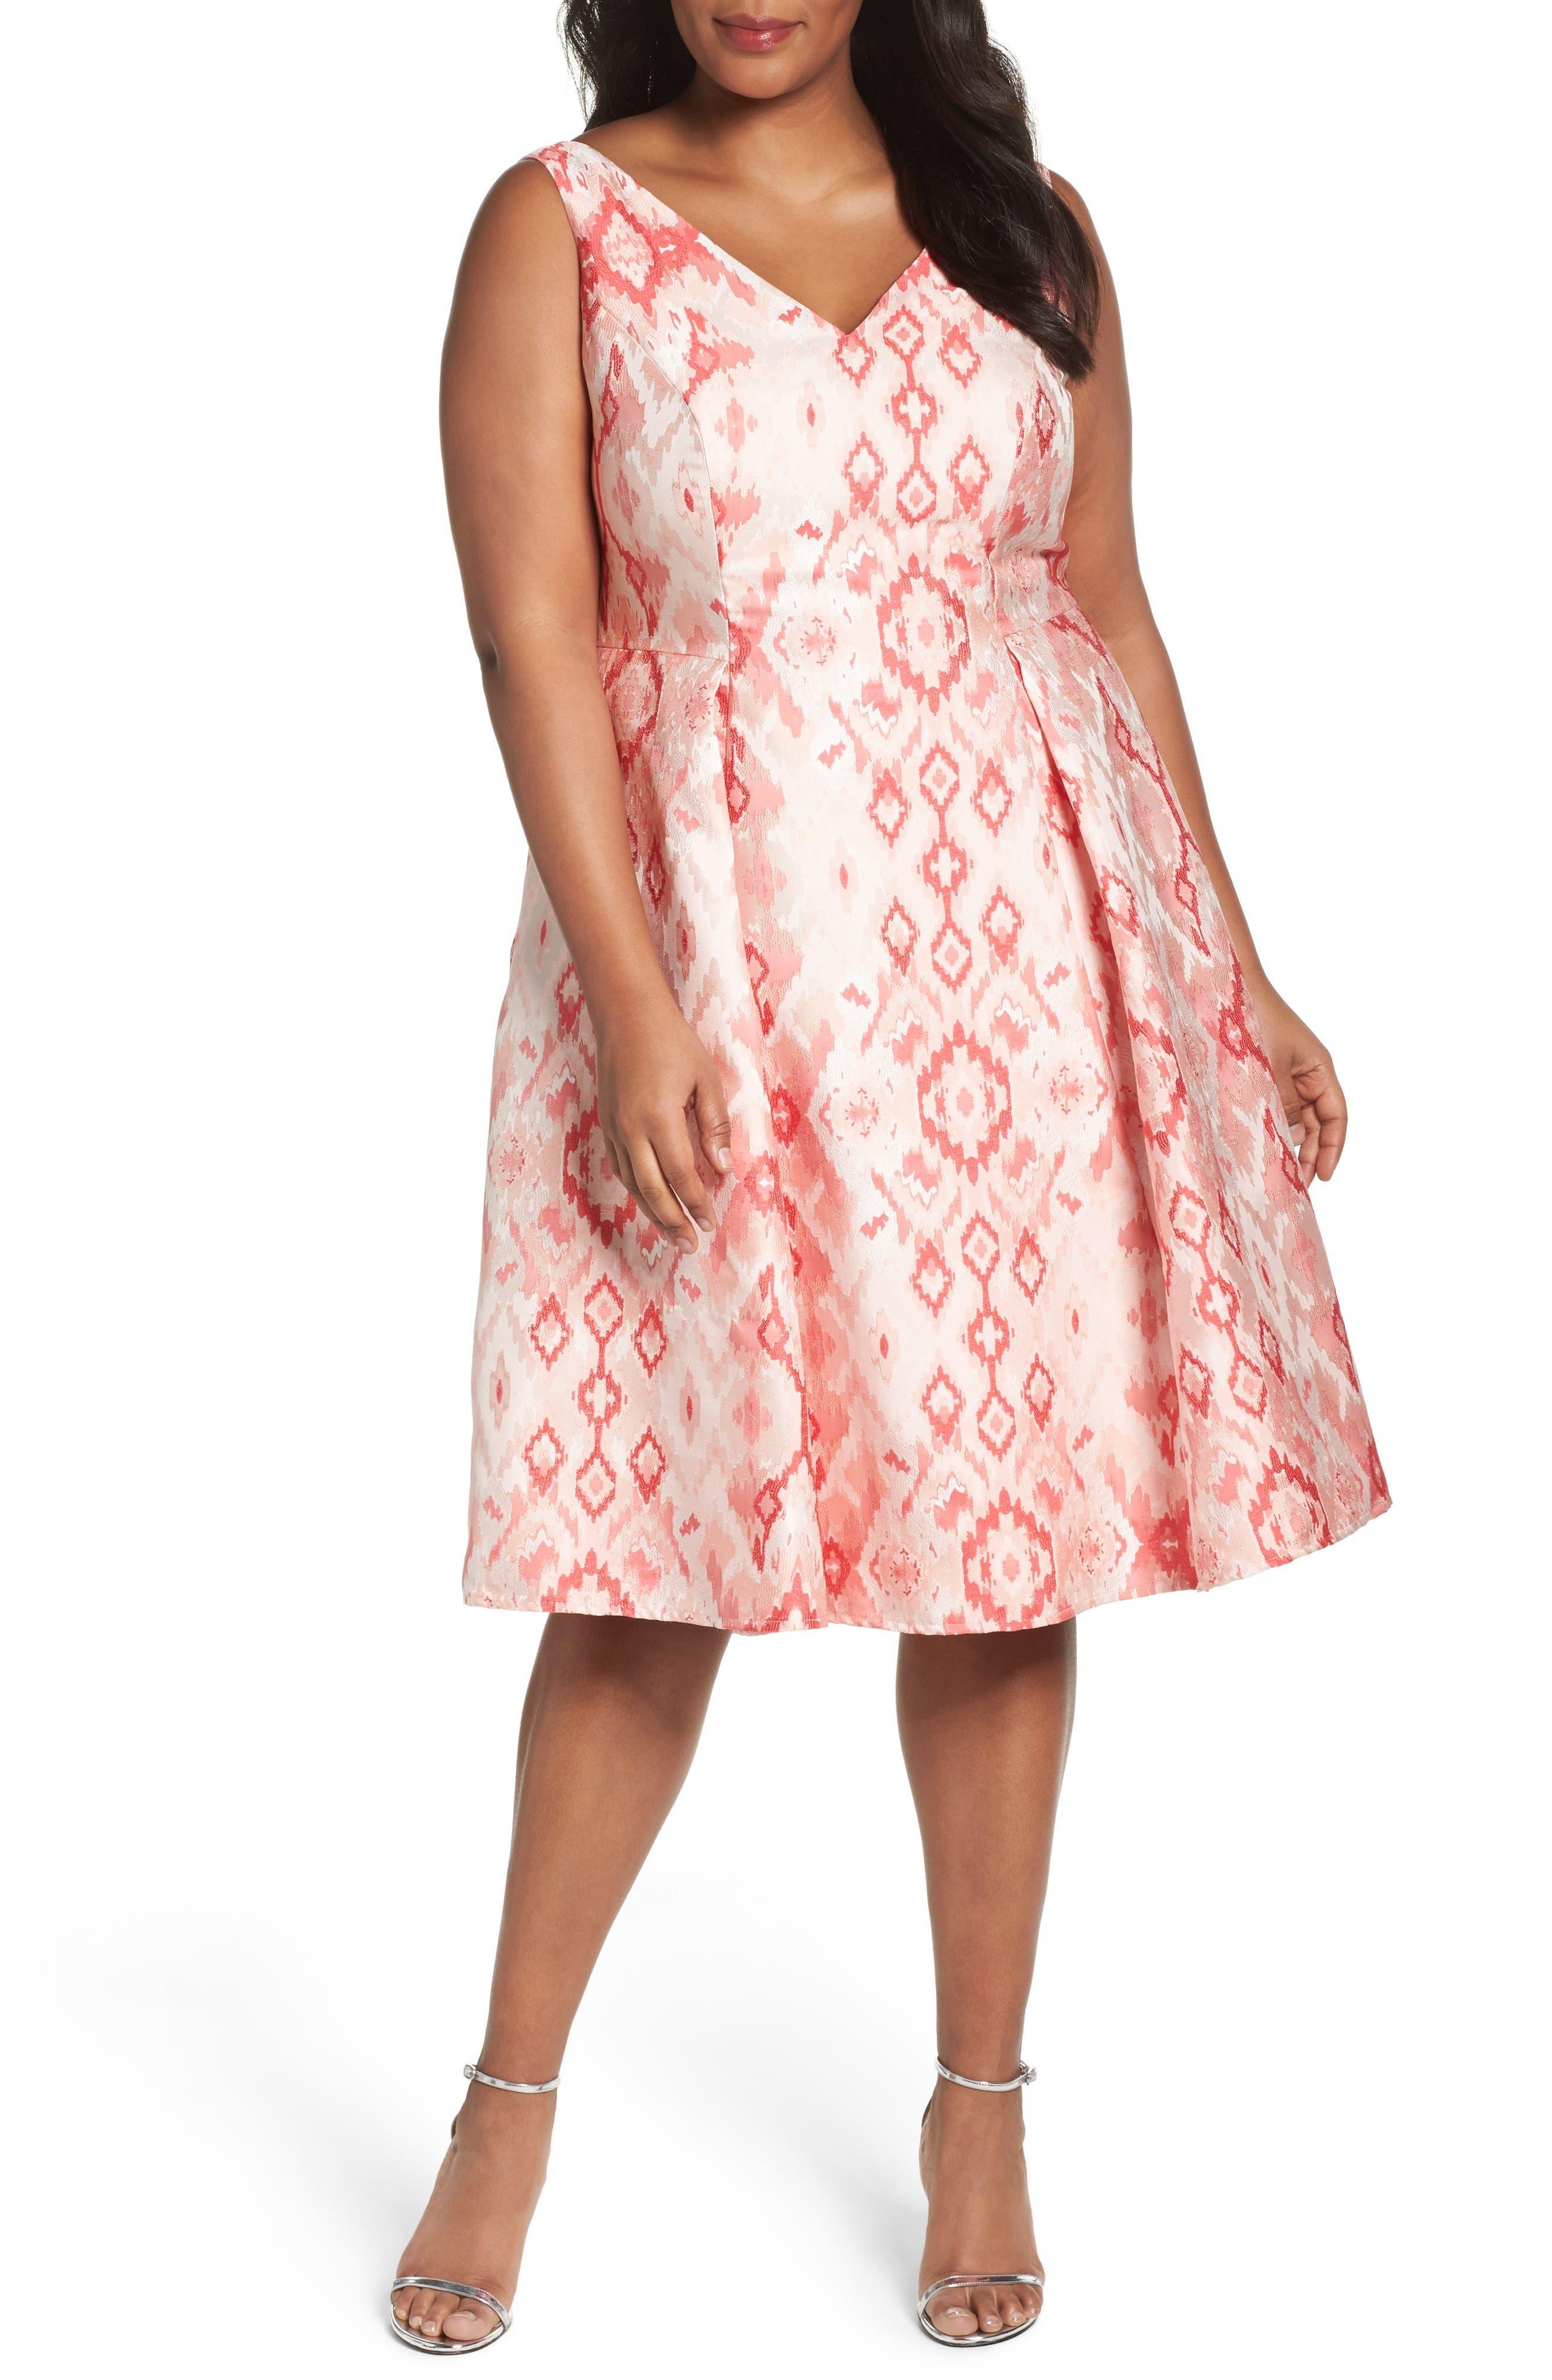 Adrianna Papell Aztec Jacquard Tea Length Dress (Plus Size)